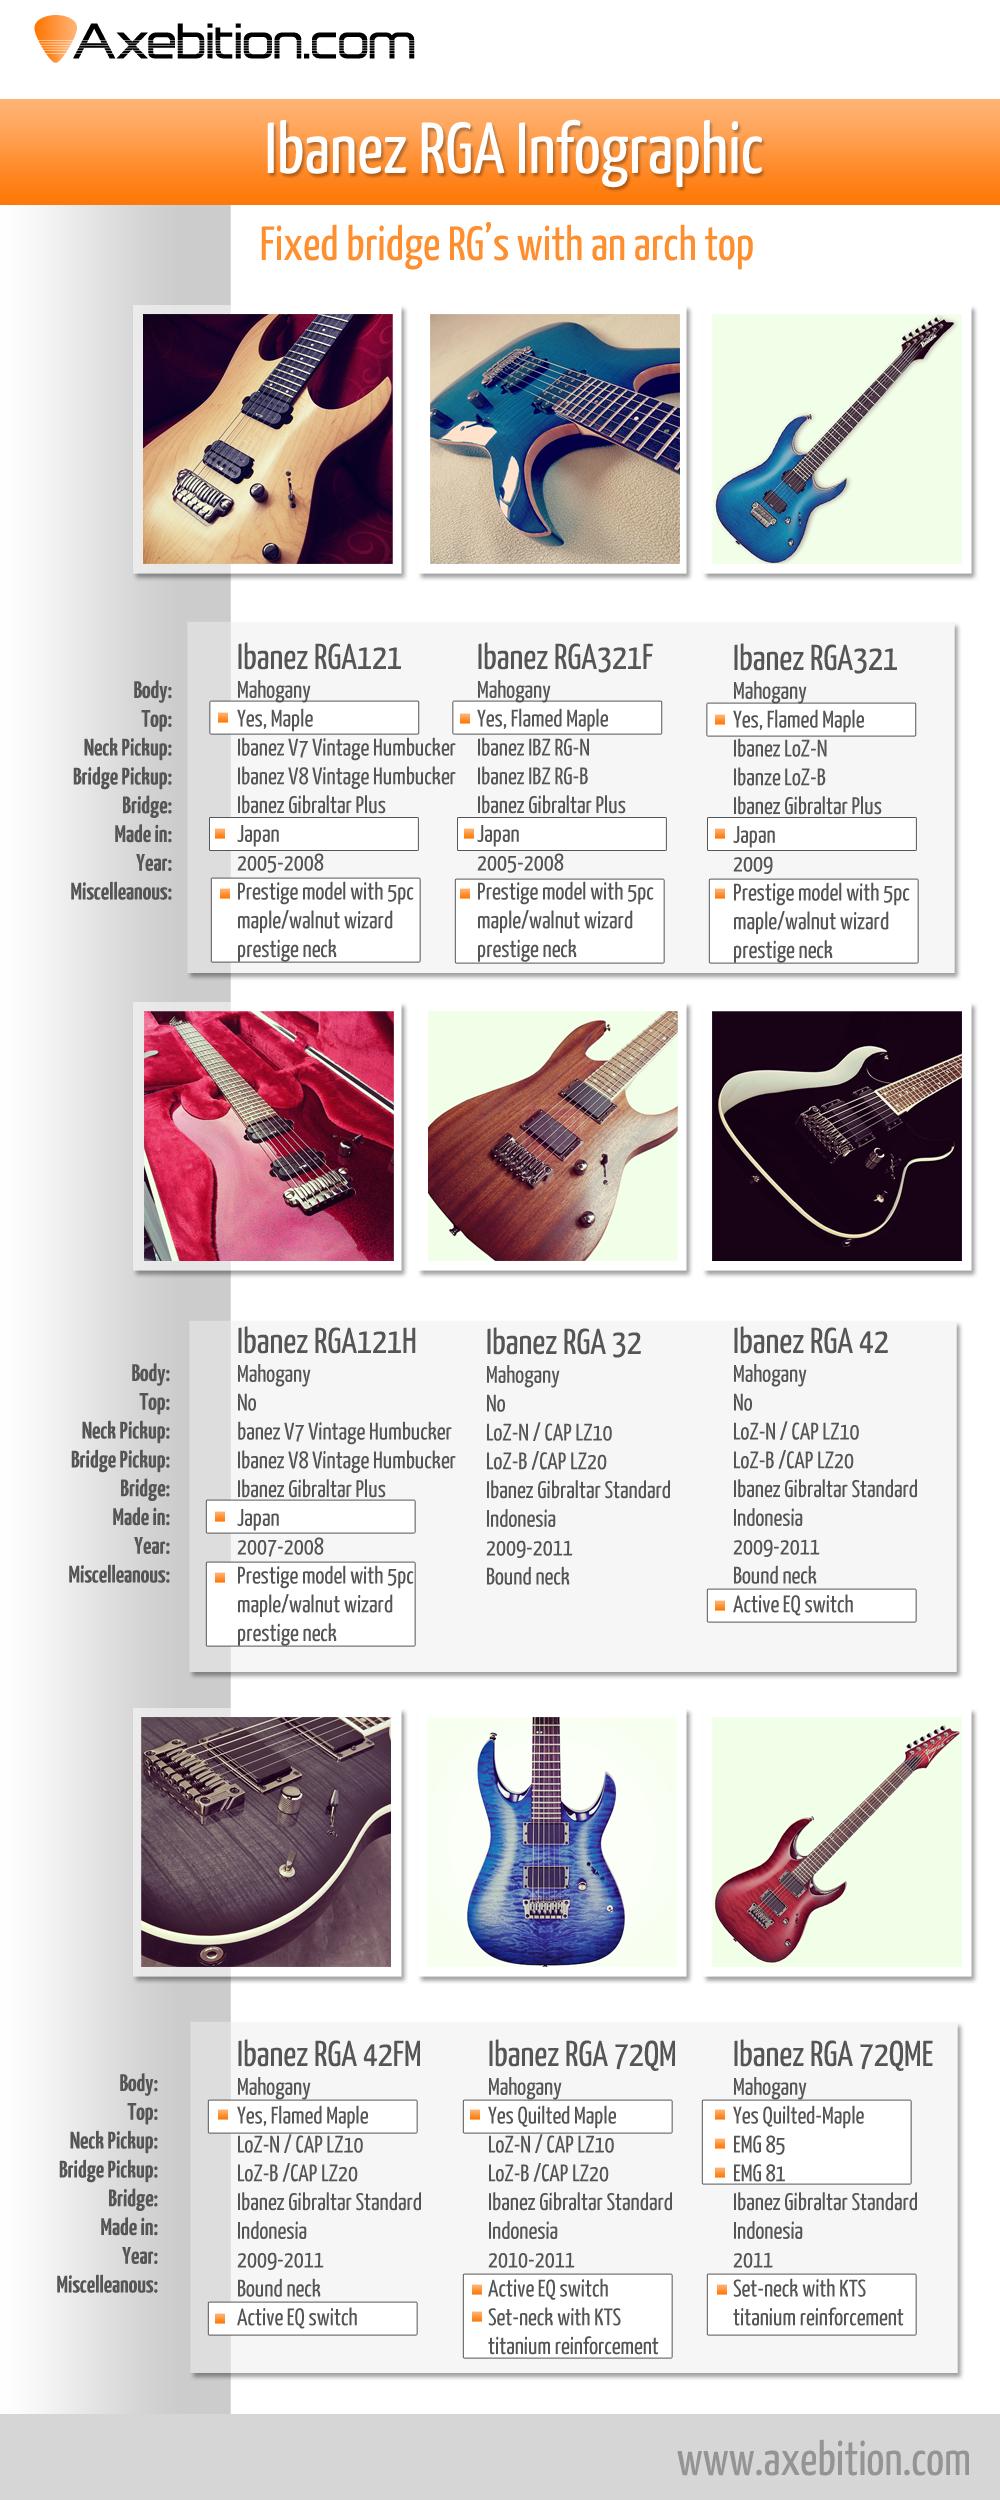 Ibanez RGA series Infographic